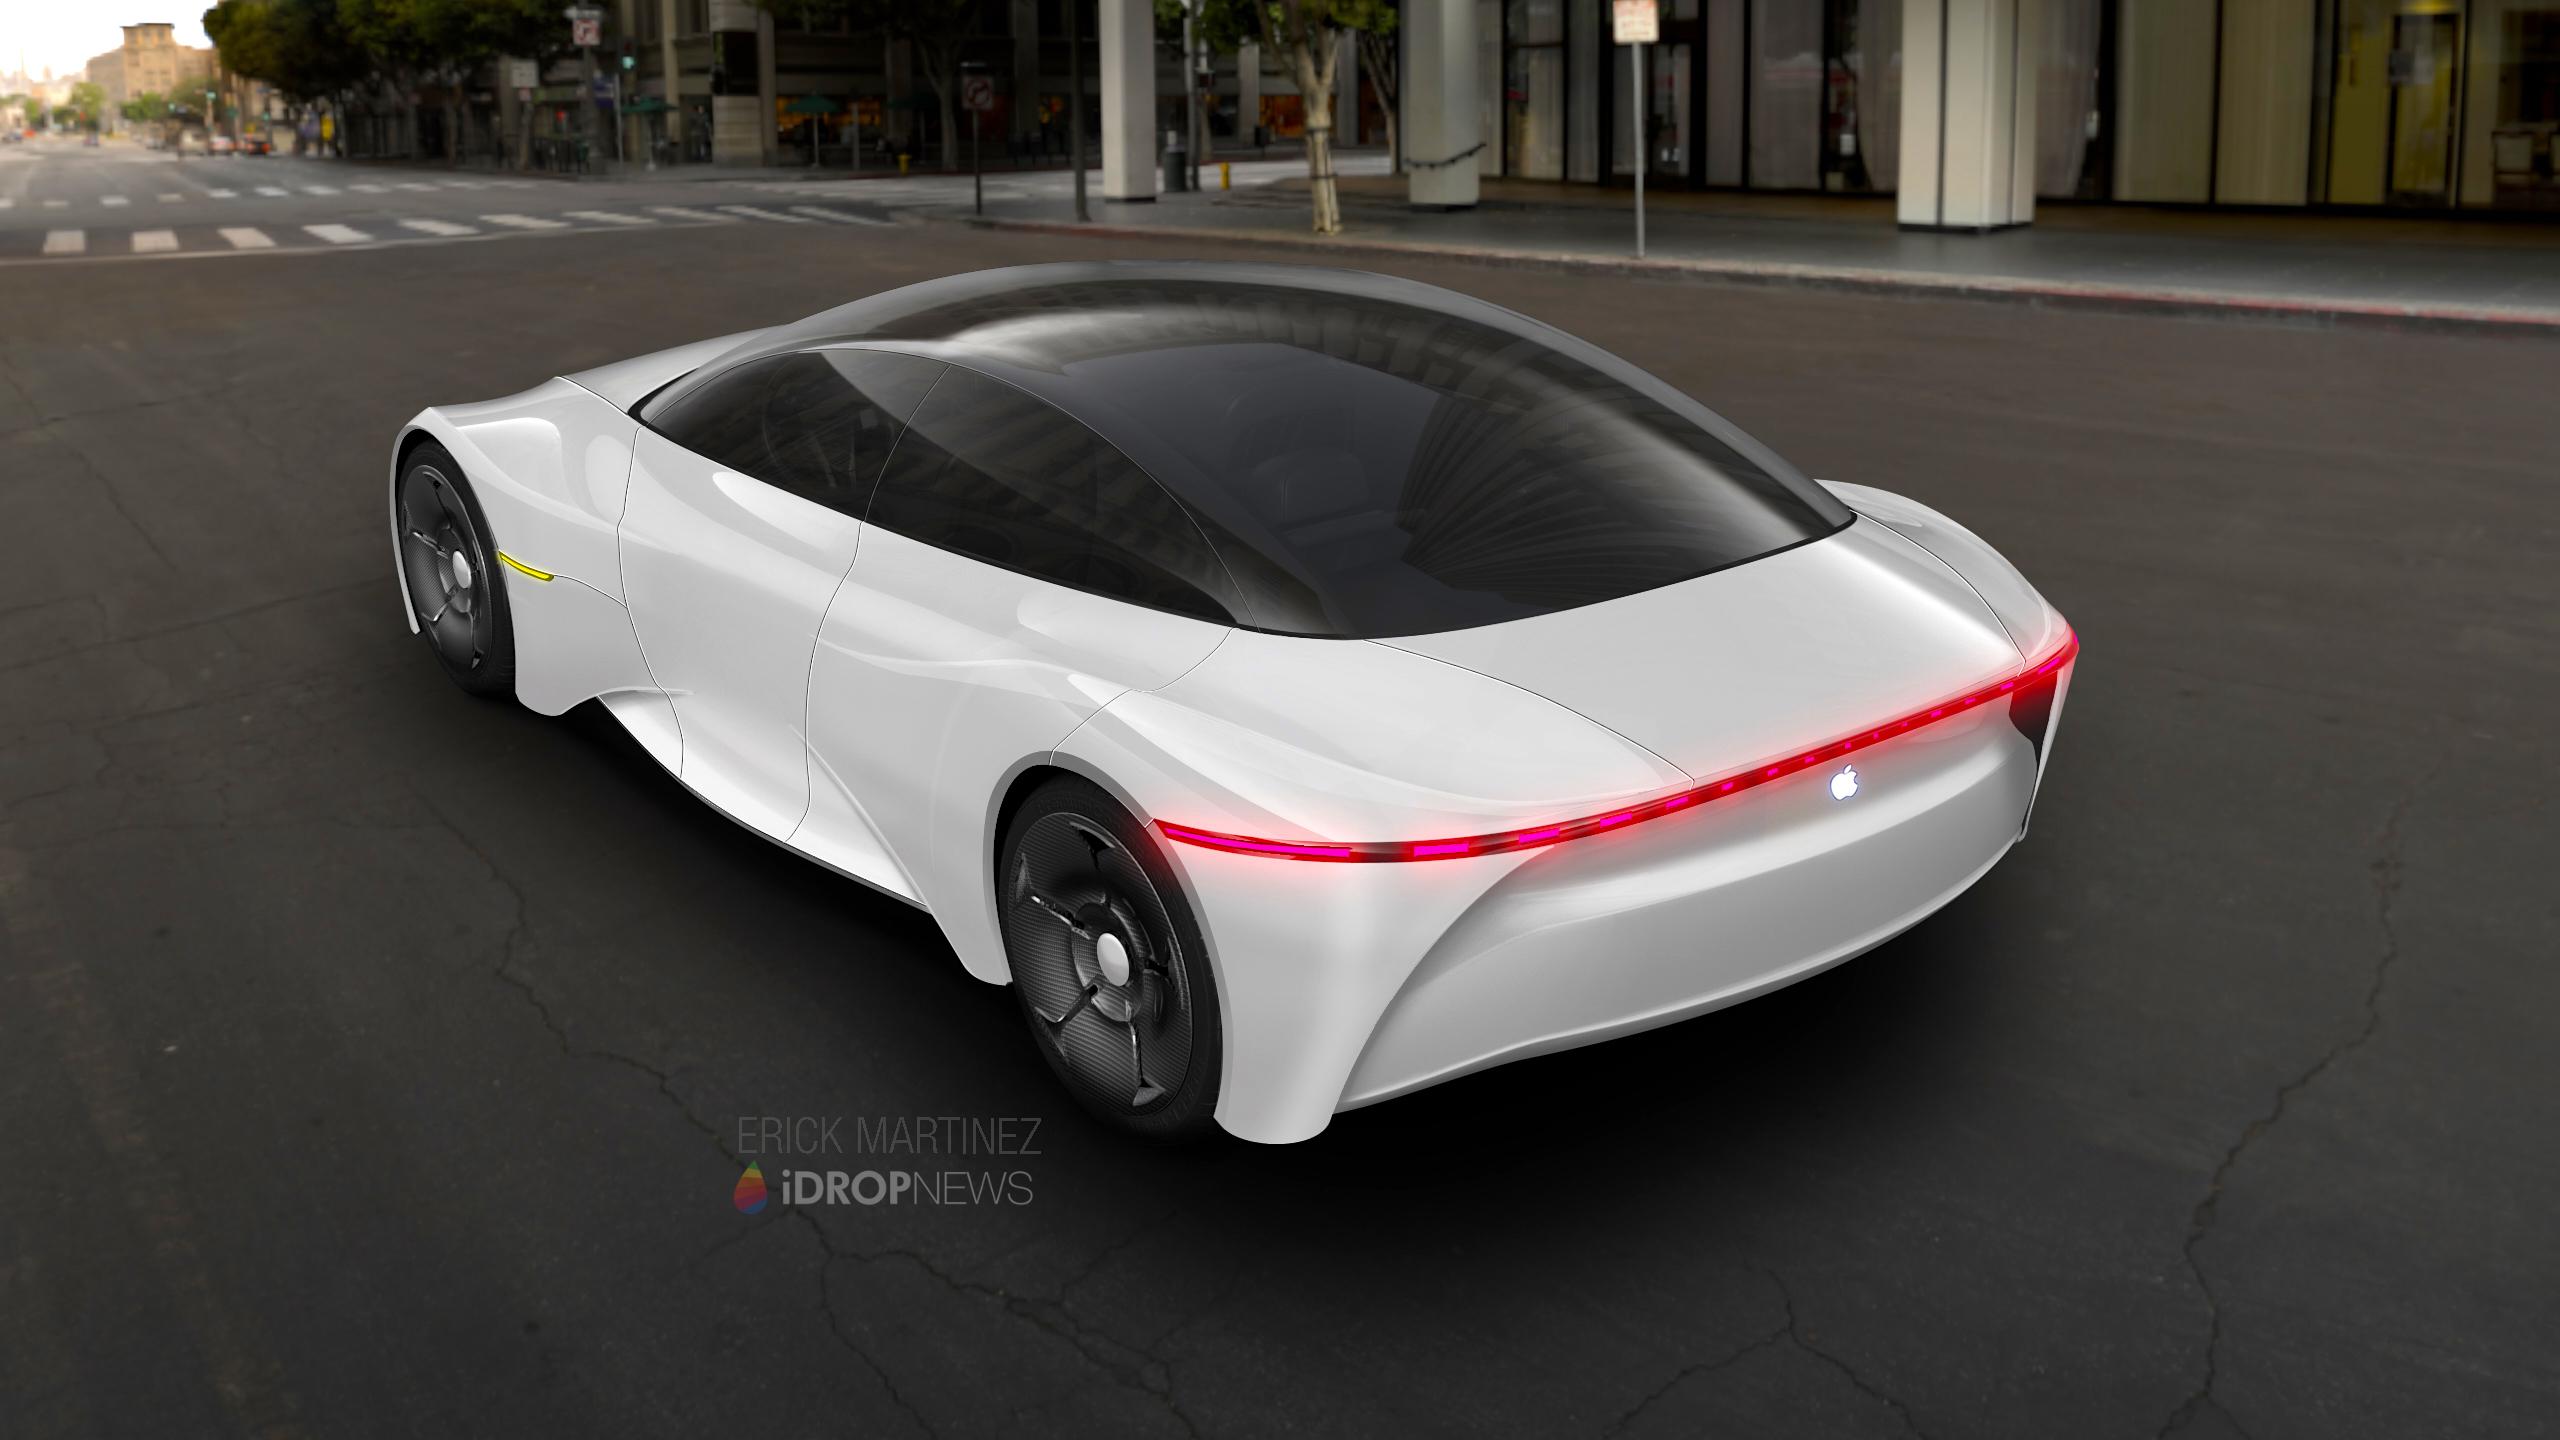 apple-car-concept-renders-idrop-news-1